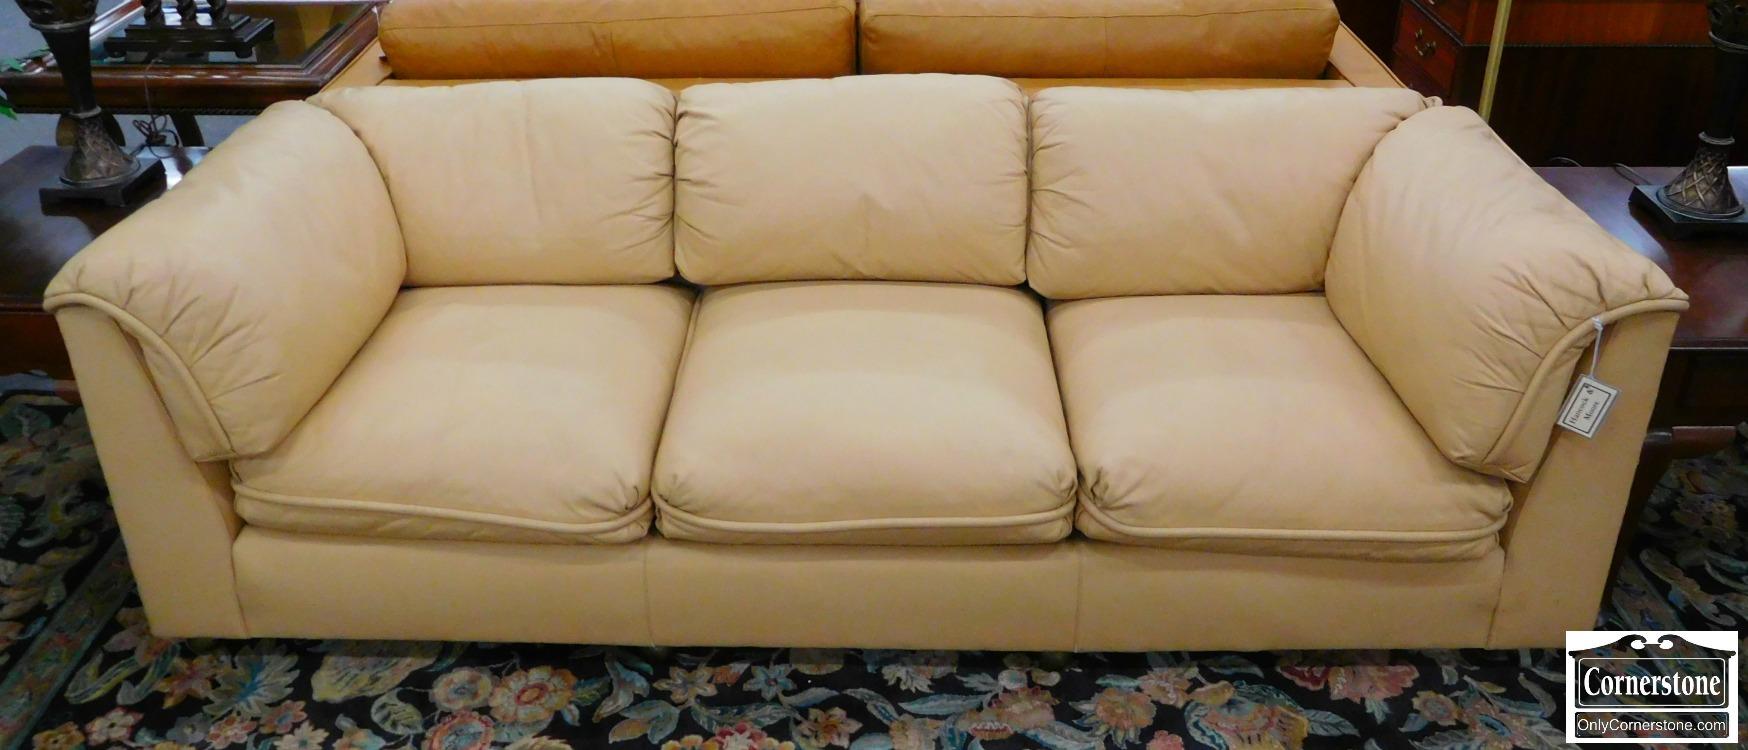 leather sofa Baltimore Maryland Furniture Store Cornerstone